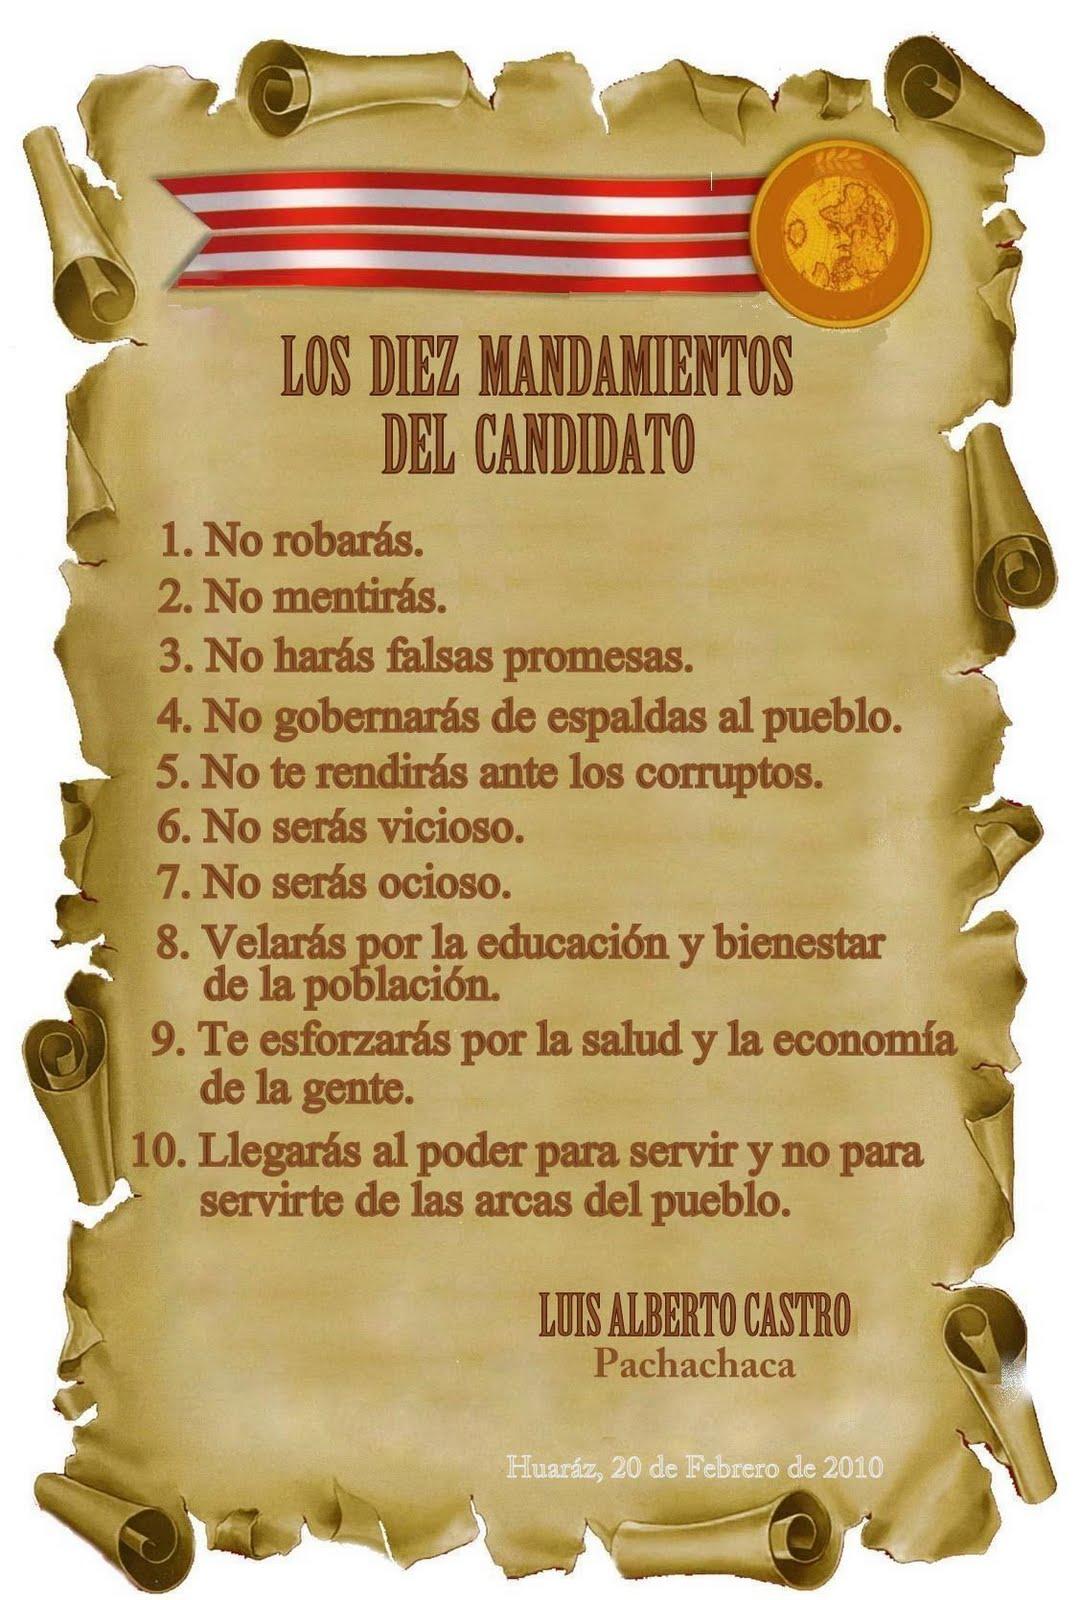 Mandamientos Del Matrimonio Catolico : Monthly archives julio images frompo